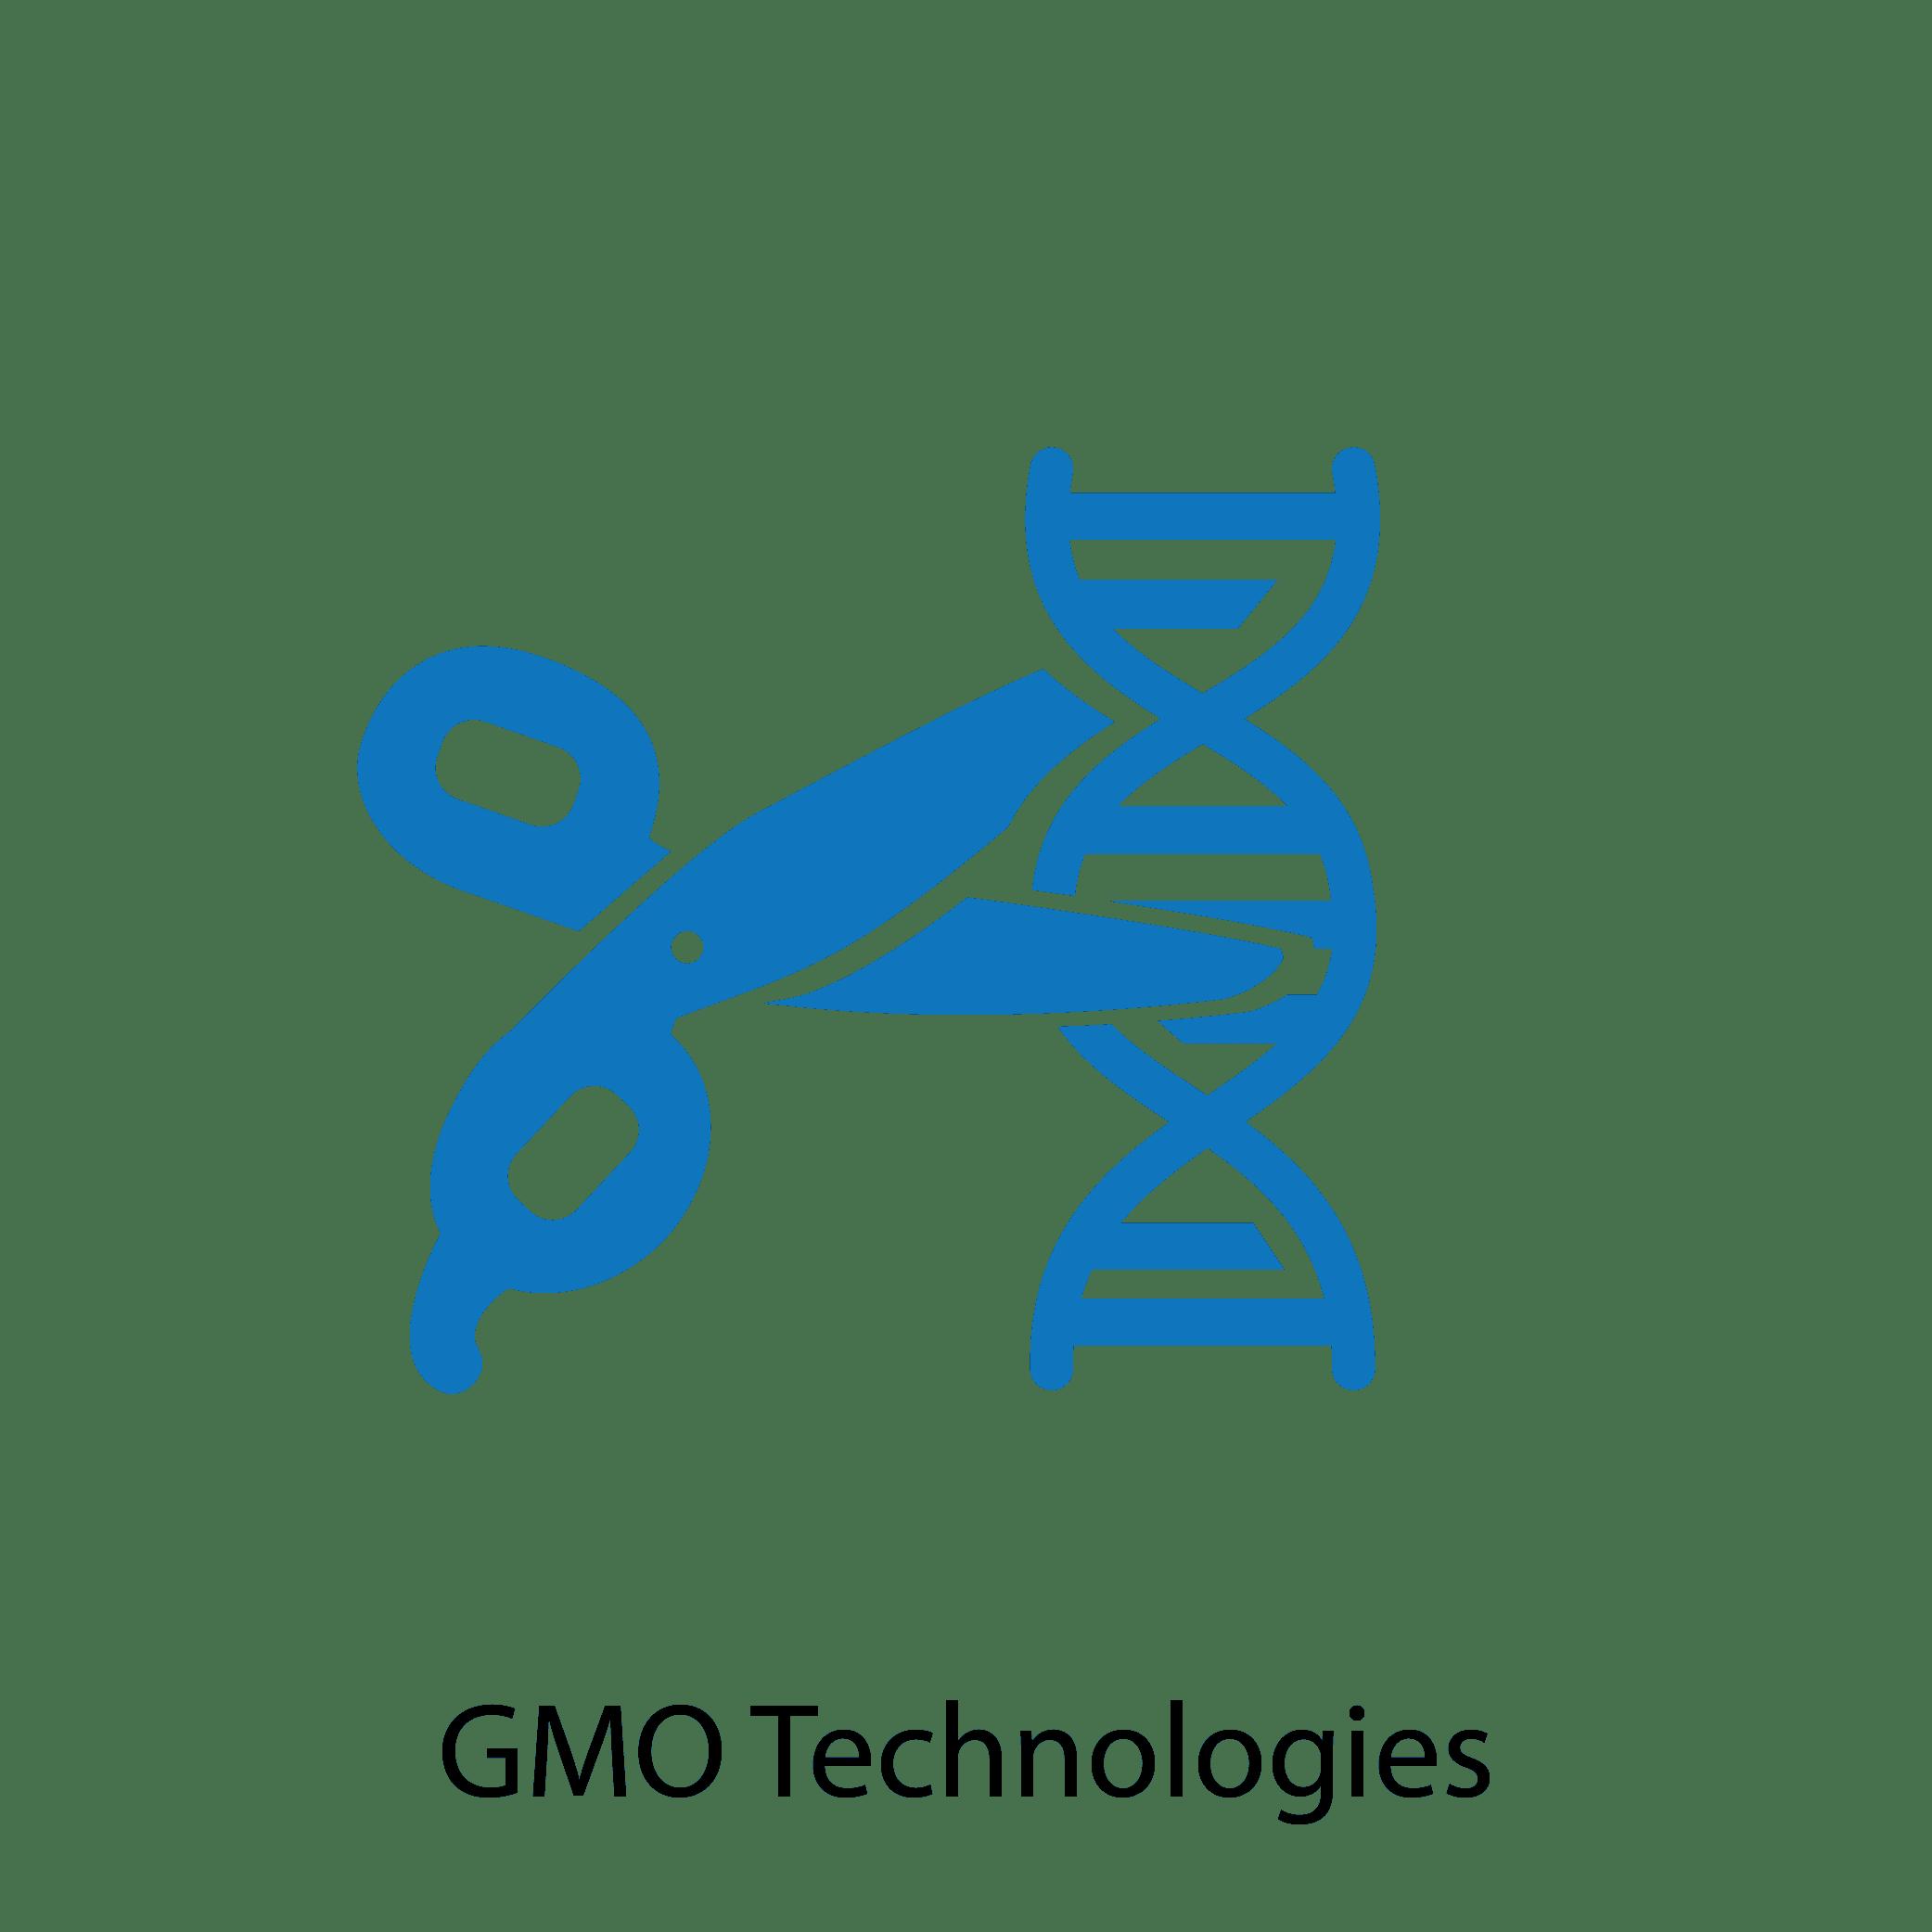 GMO technologies